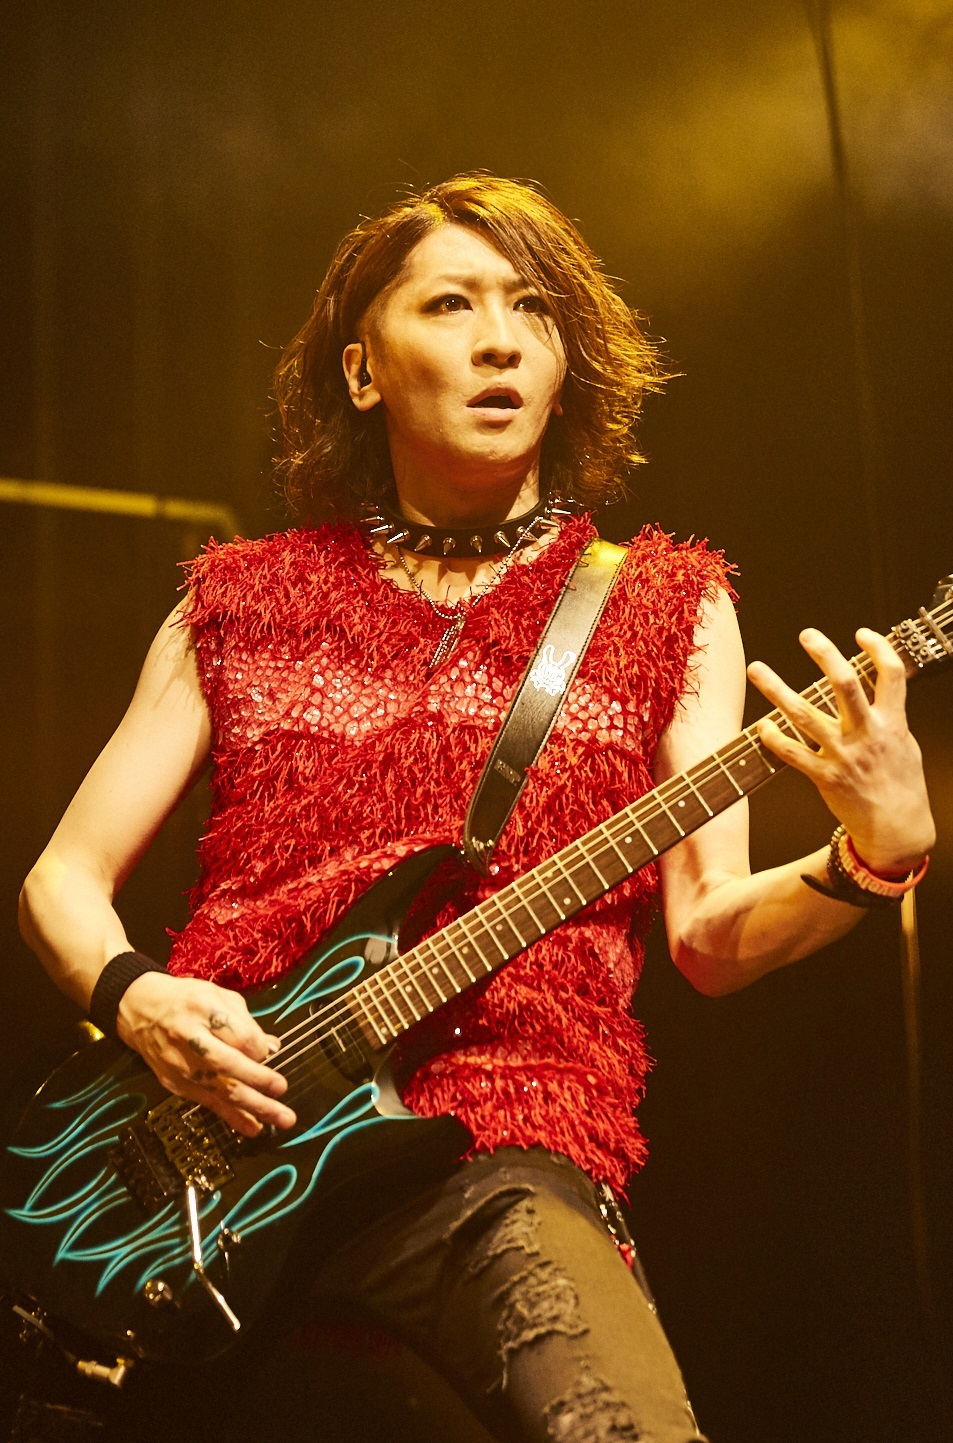 LM.C/Aiji